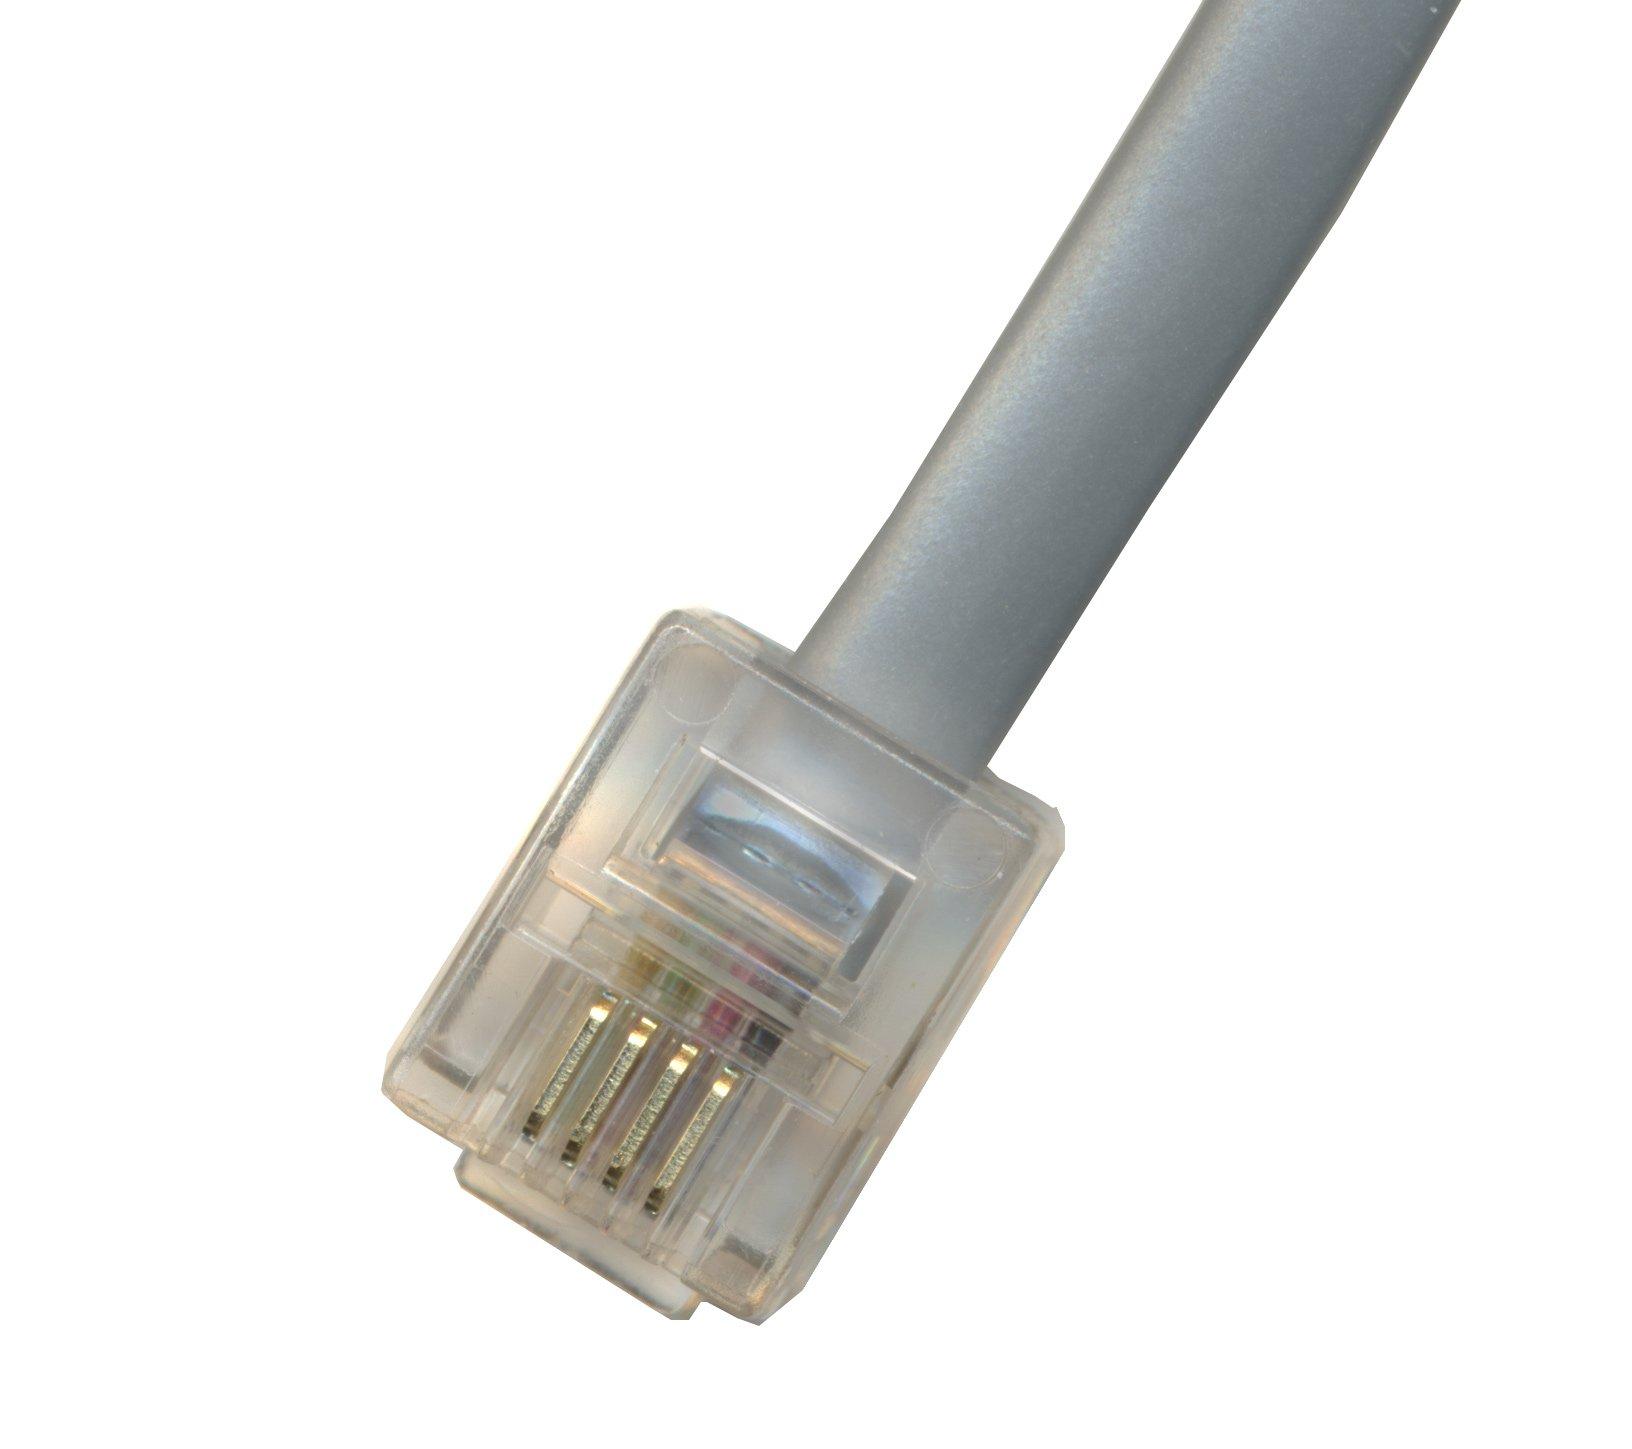 RiteAV - 65FT (19.8M) RJ11 Male to RJ11 Male 6P4C Phone Line Cord - Gray by RiteAV (Image #1)